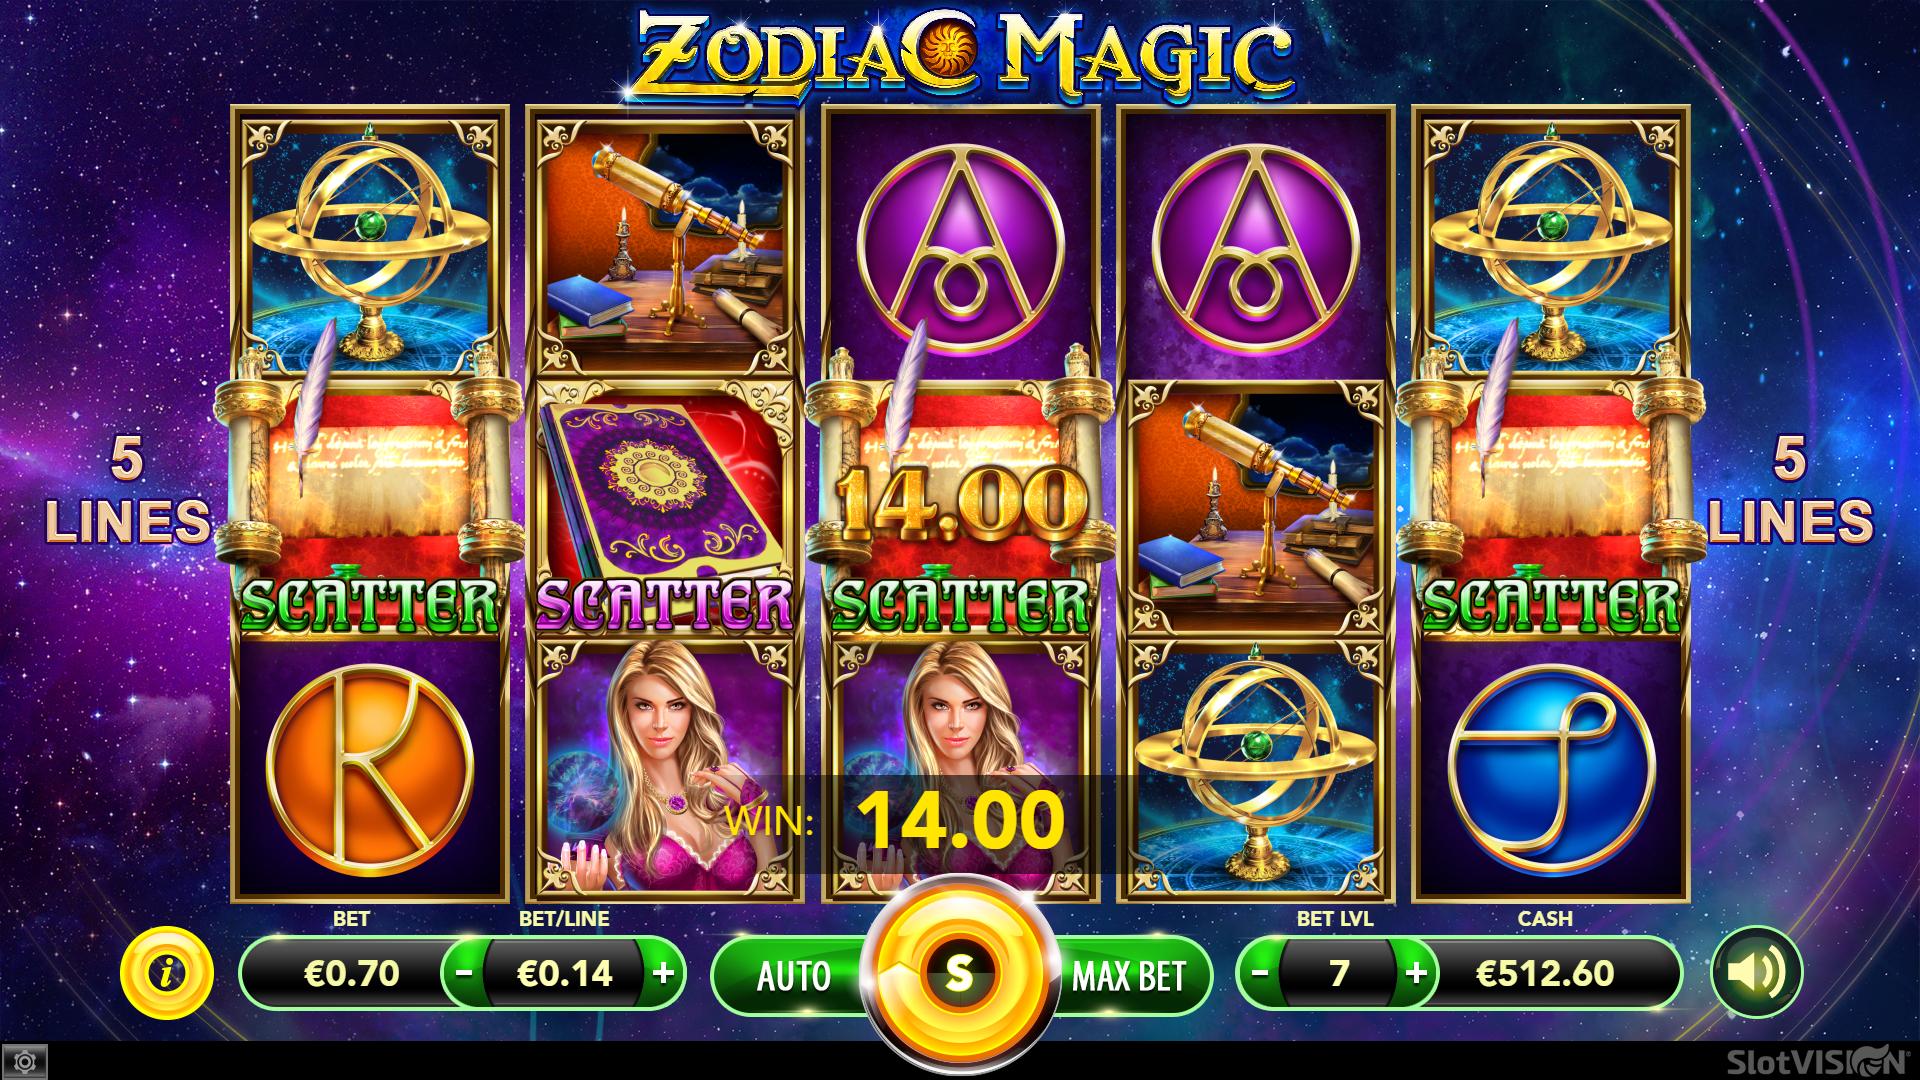 Casino ägare Slots Magic Hobbyfilmer